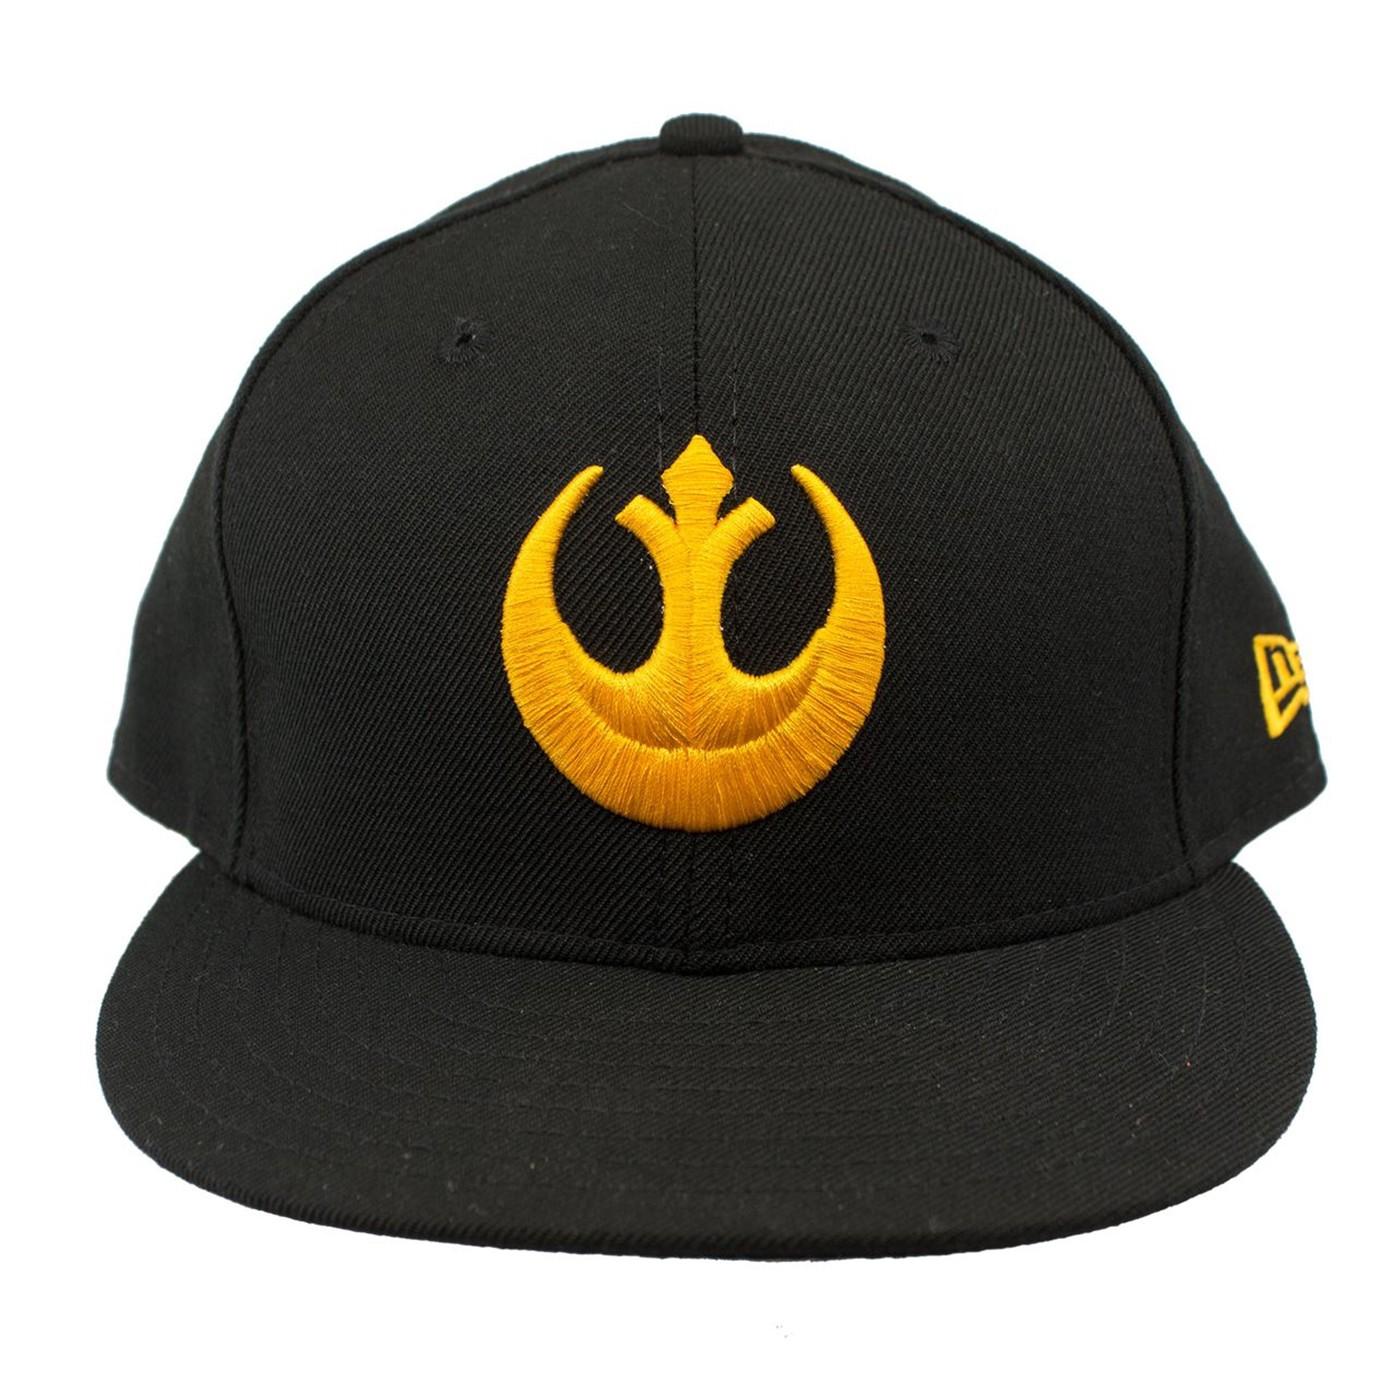 Star Wars Yellow Rebel Symbol New Era Adjustable Snapback